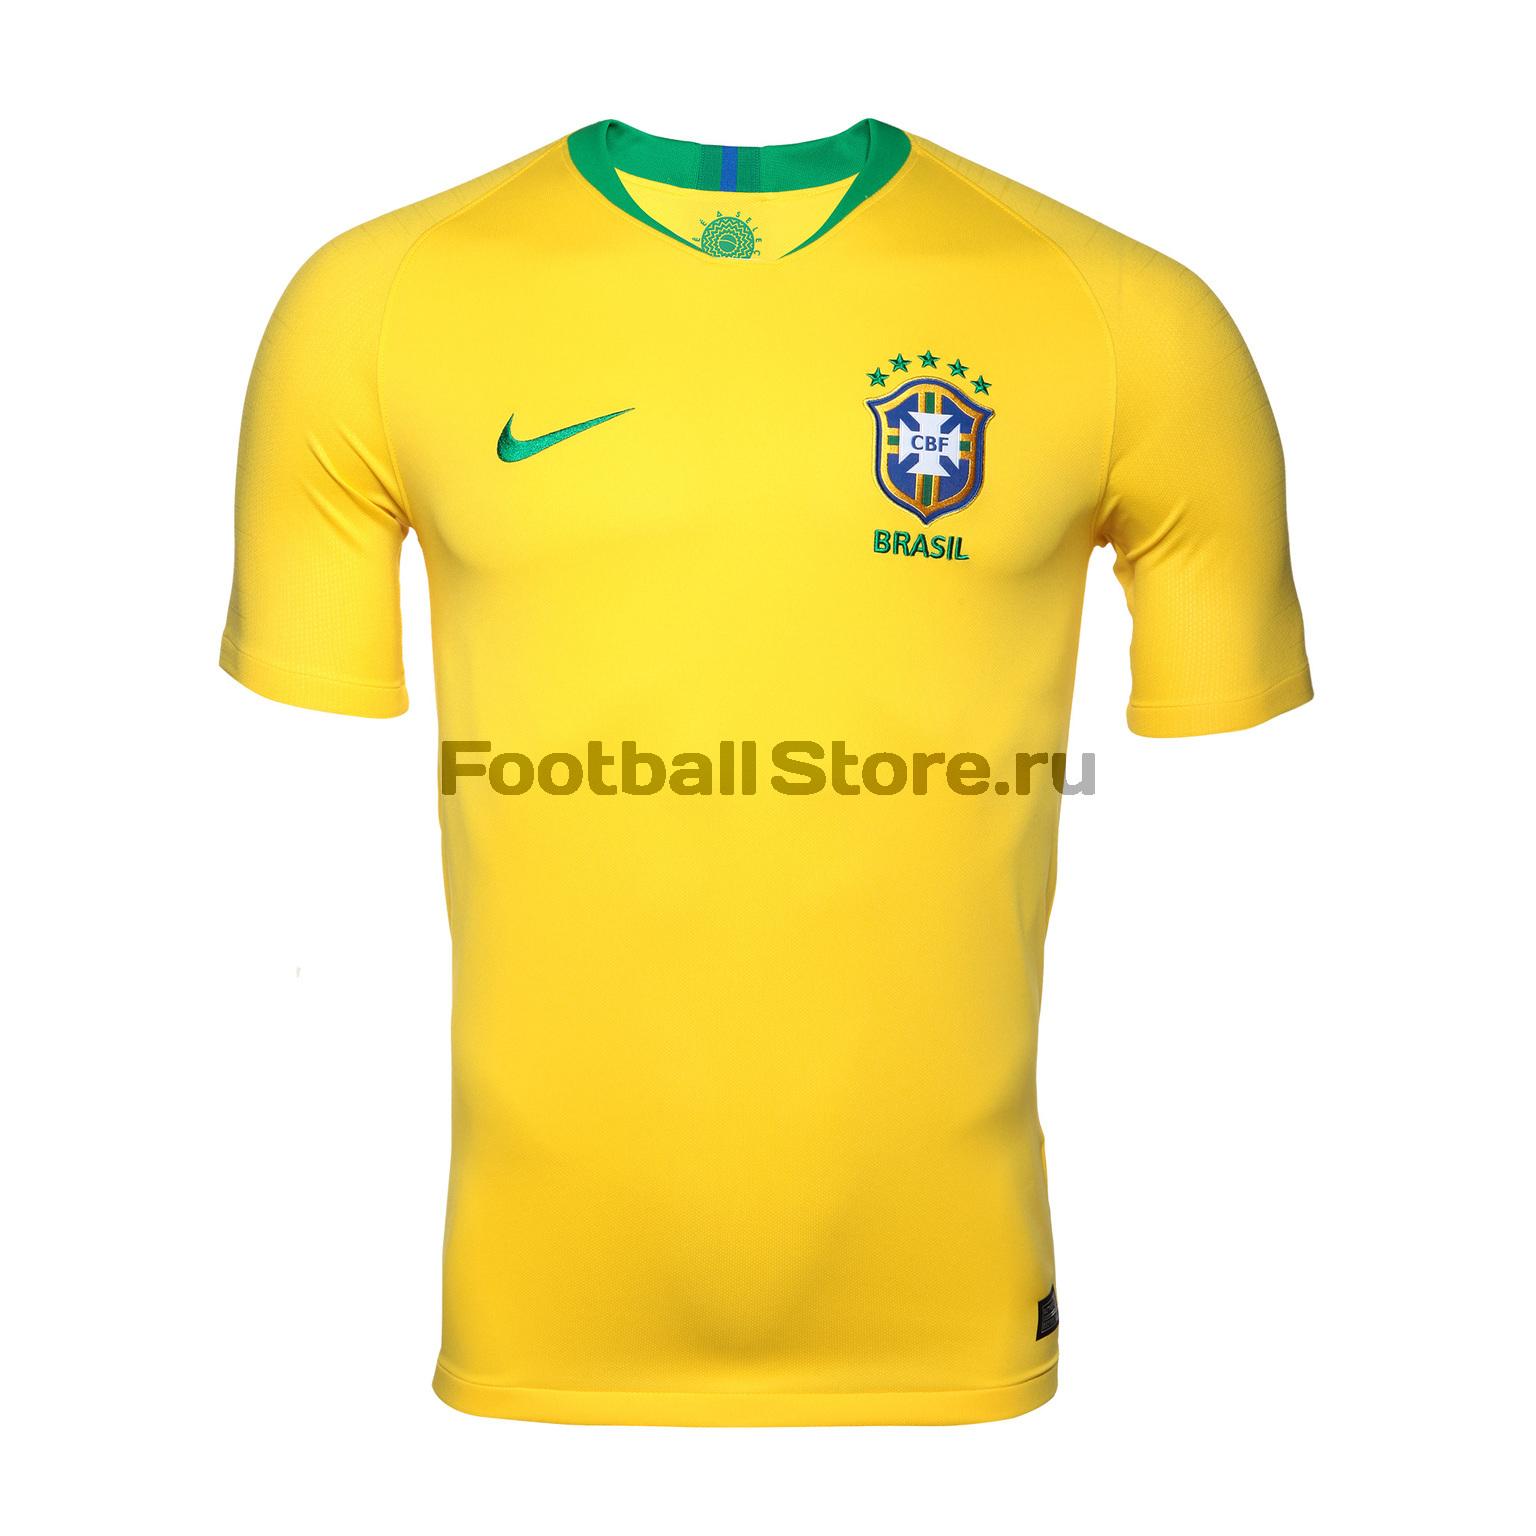 Футболка домашняя Nike сборной Бразилии 893856-749 брюки тренировочные nike сборной бразилии 893122 454